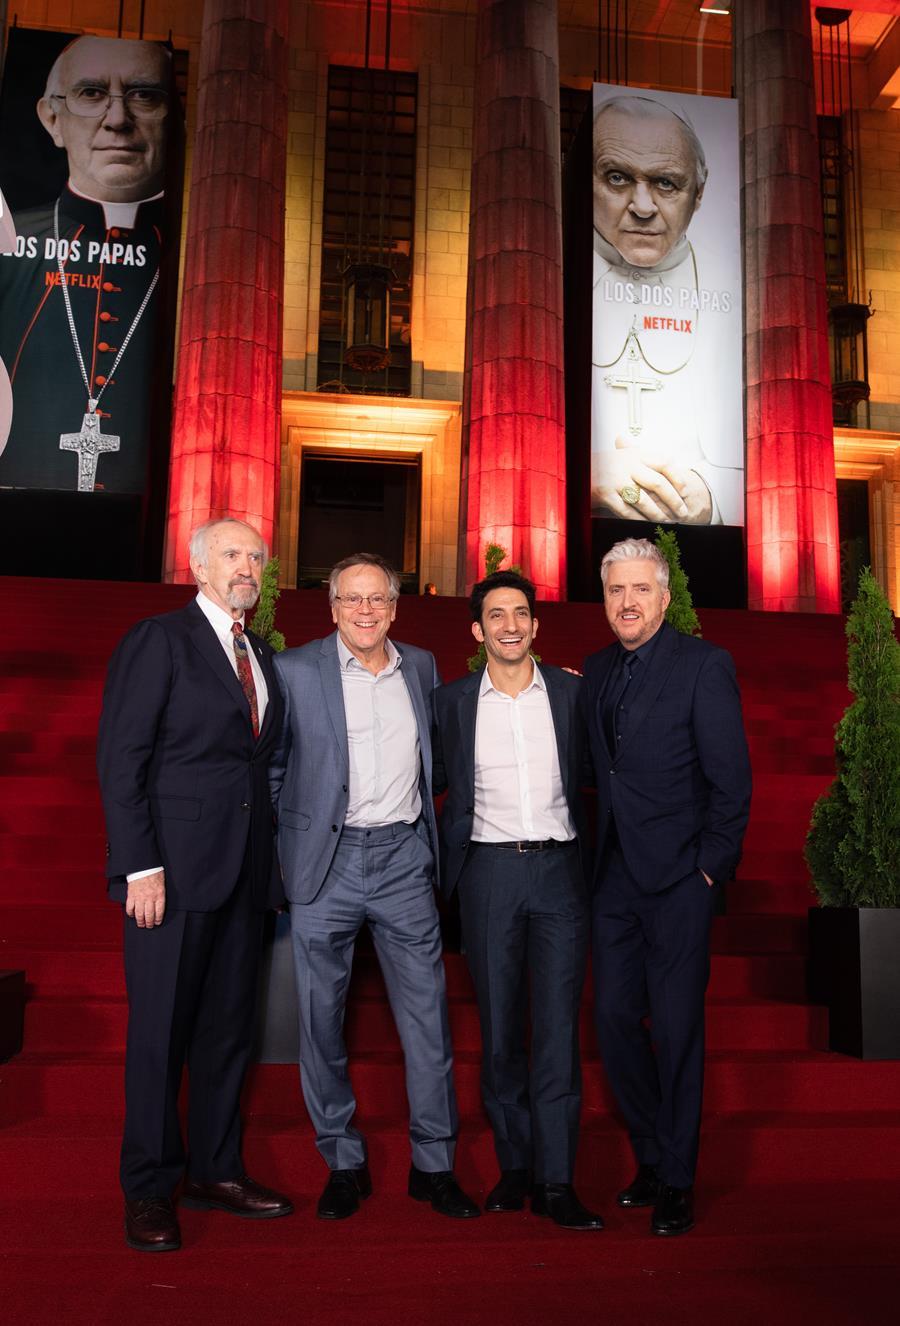 Jonathan Pryce, Juan Minujín Y Fernando Meirelles presentaron «Los dos Papas» en Argentina